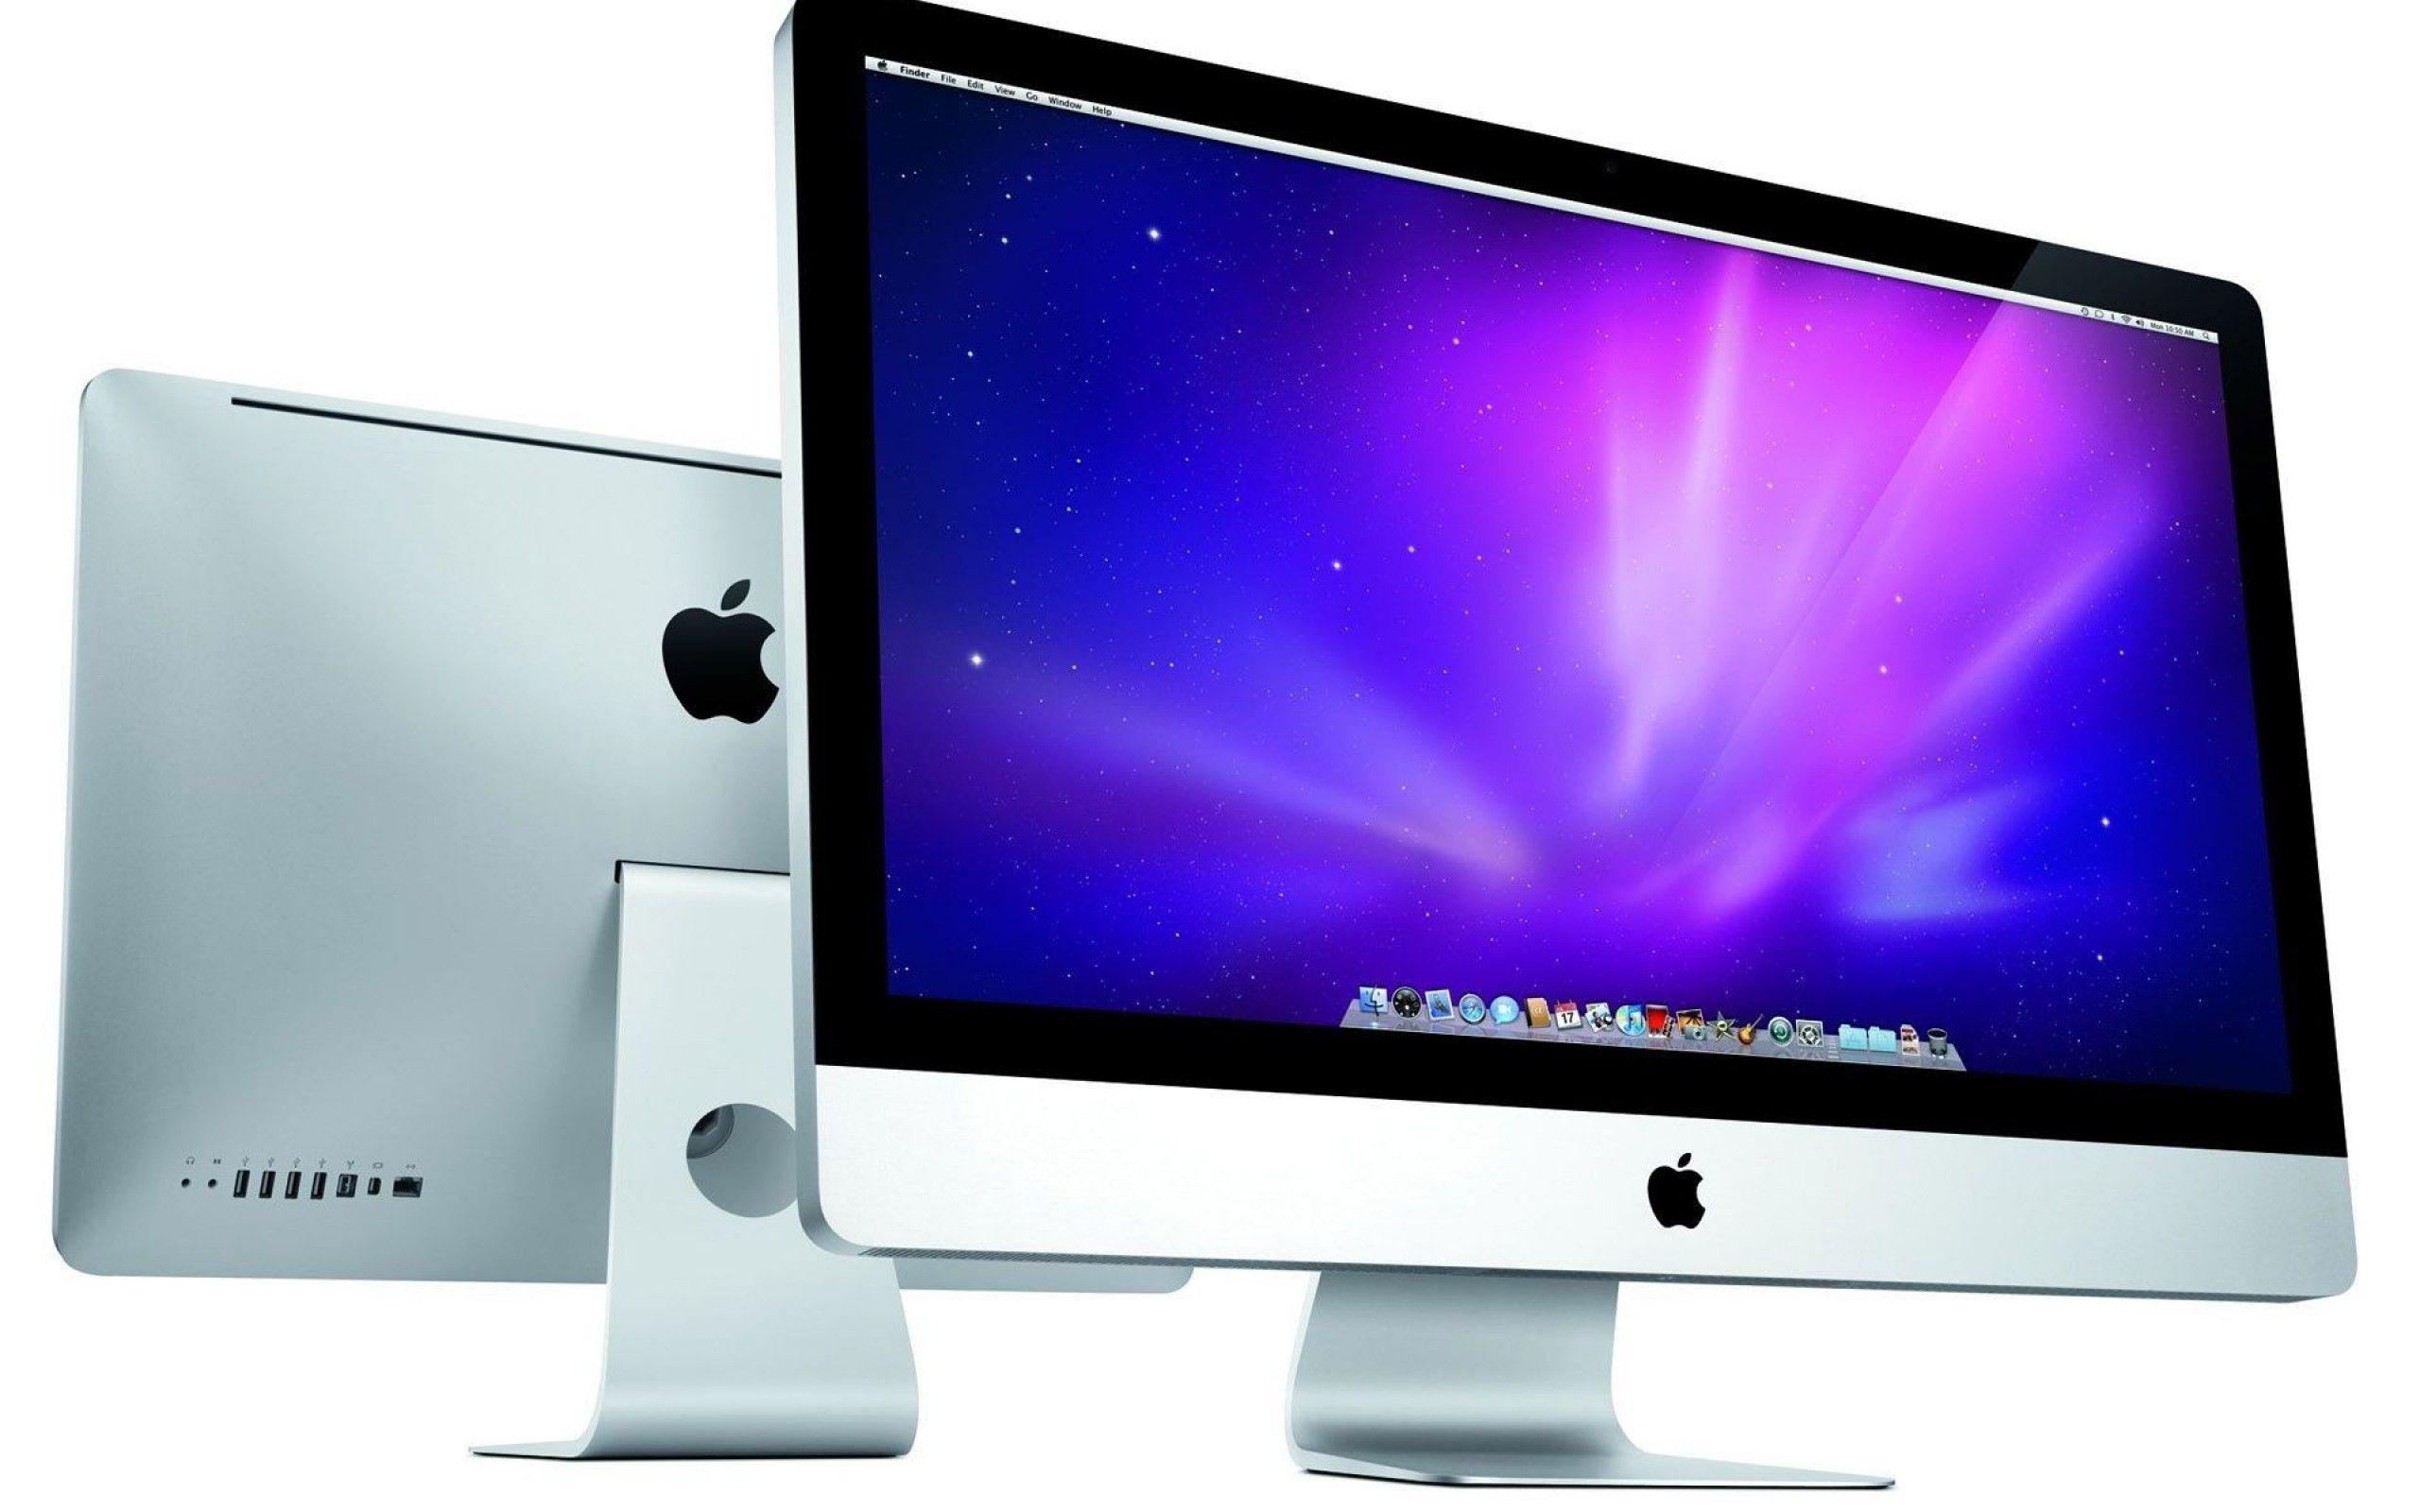 i mac 22 model only 1899 at best buy apple in 2019 mac rh pinterest com